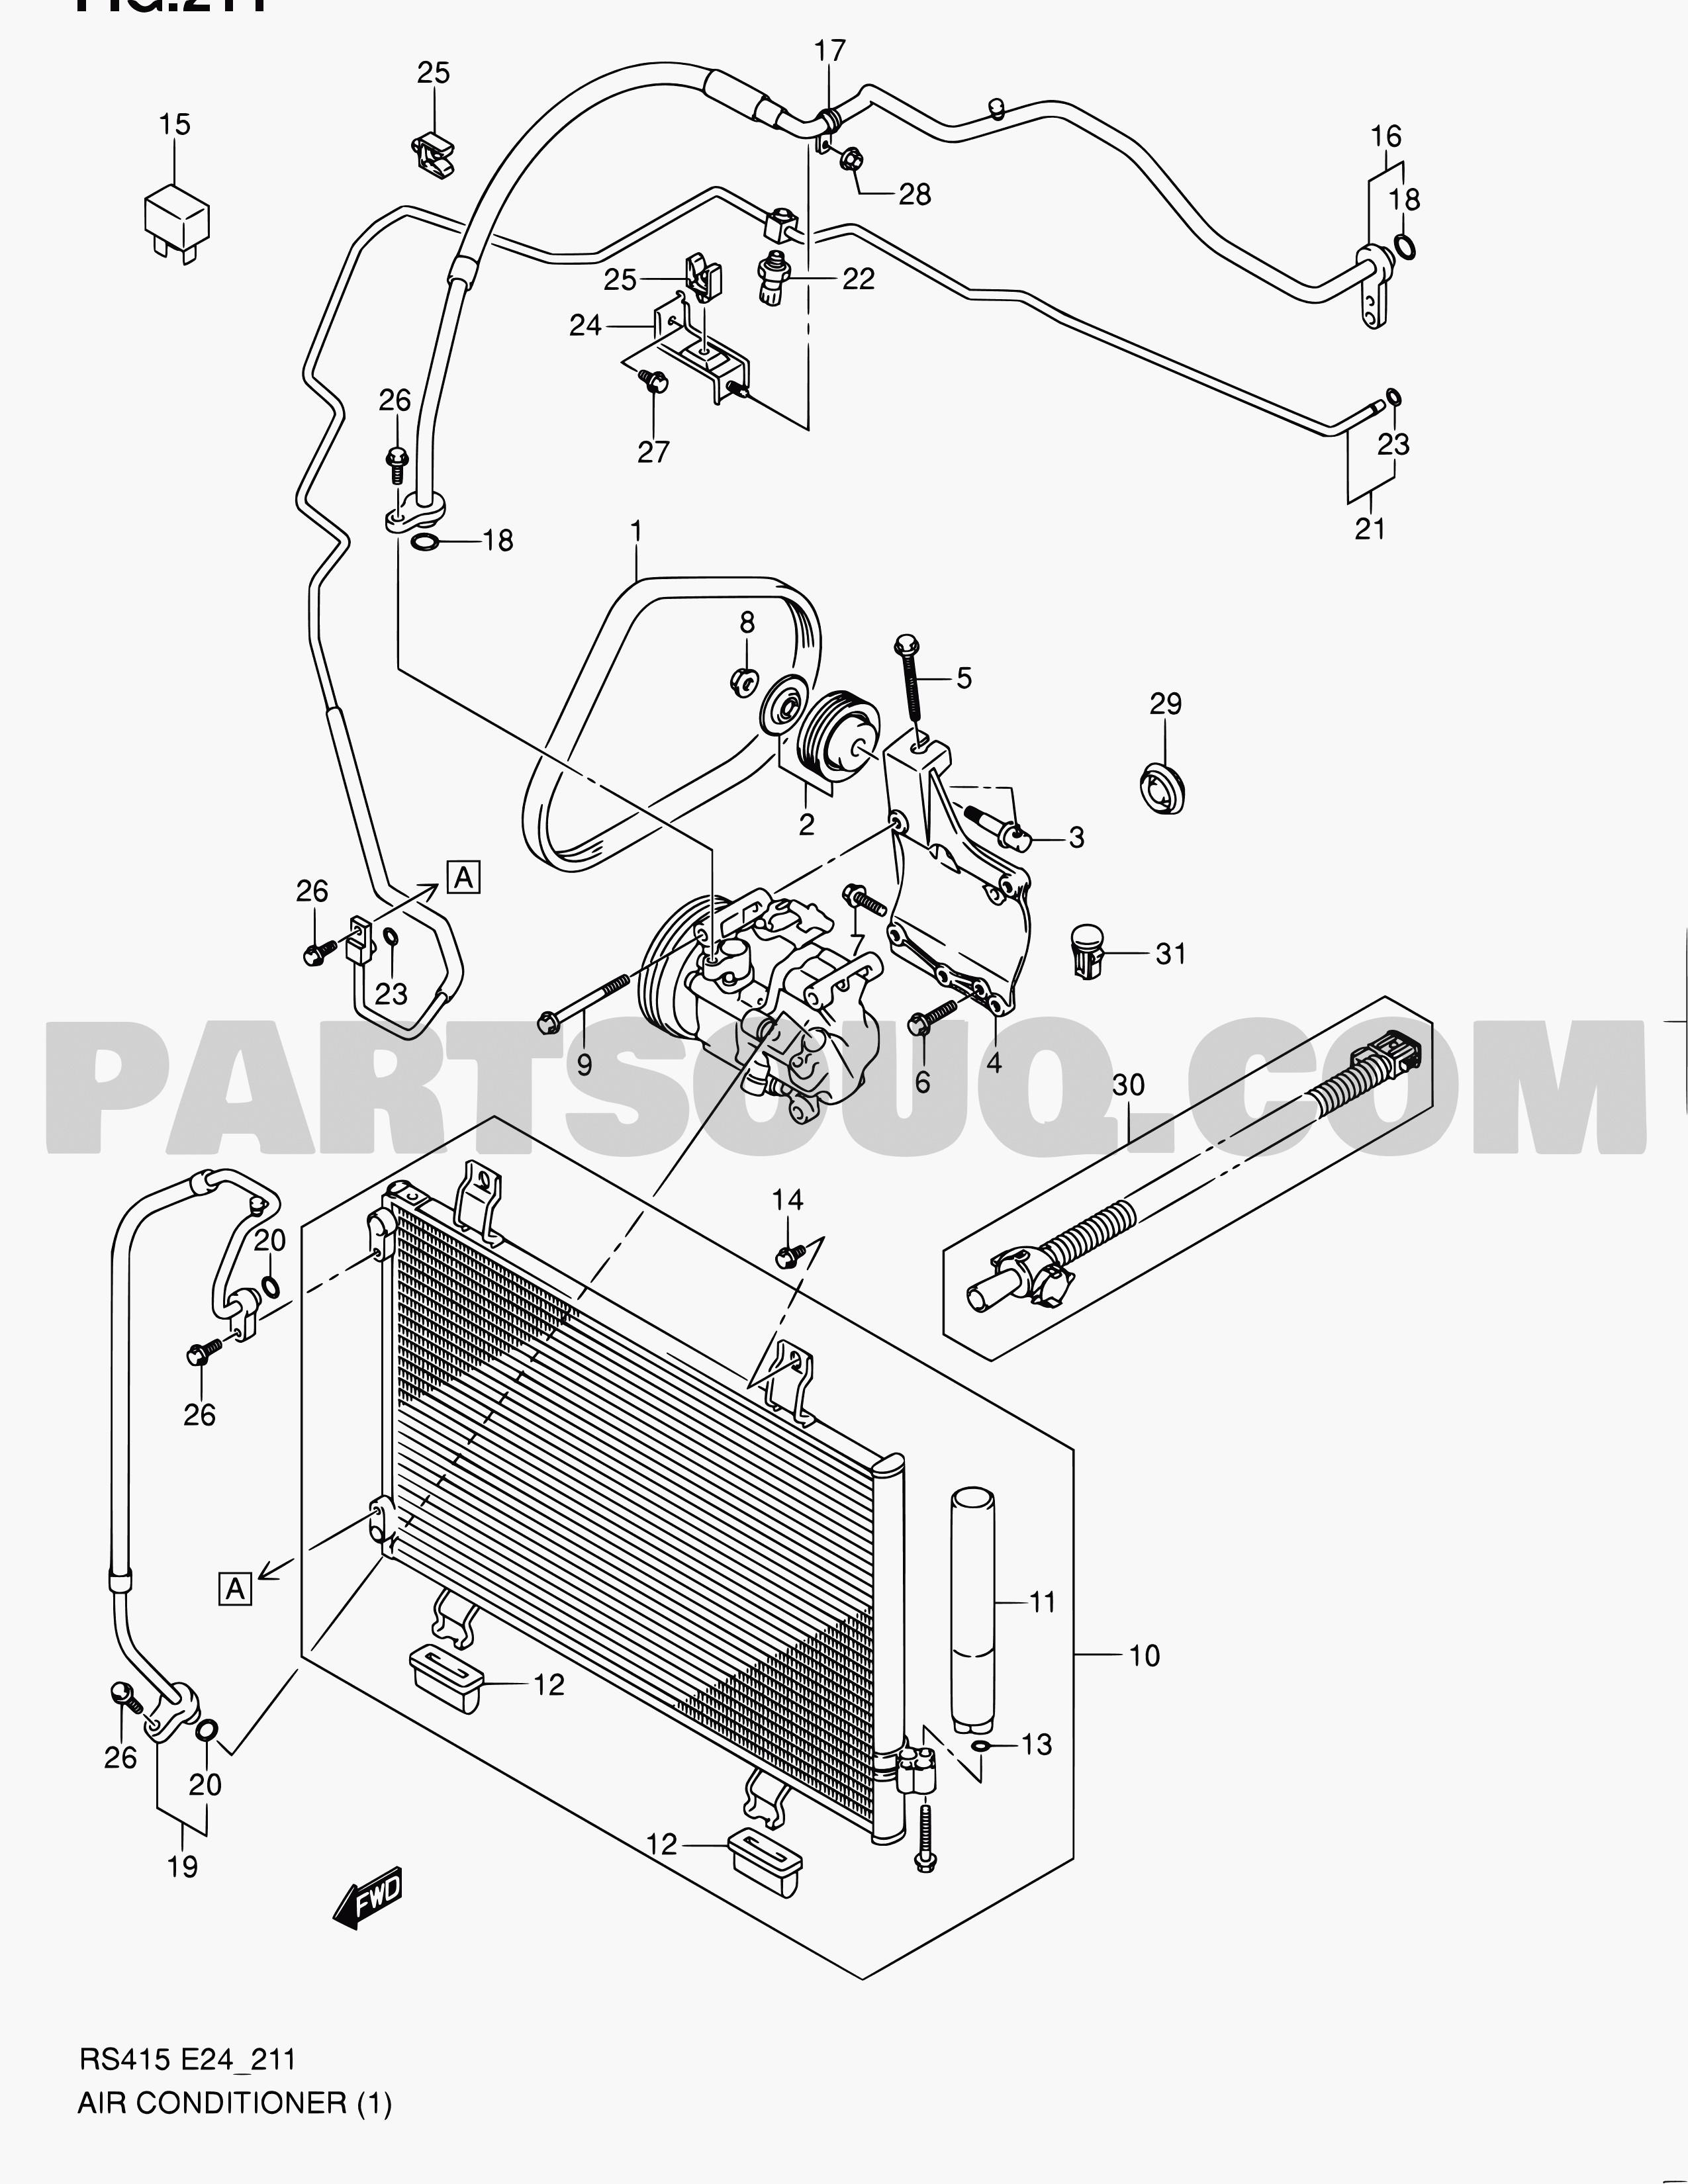 Auto Air Conditioning Parts Diagram 15 Air Conditioning Swift Rs413 Rs413 Suzuki Of Auto Air Conditioning Parts Diagram